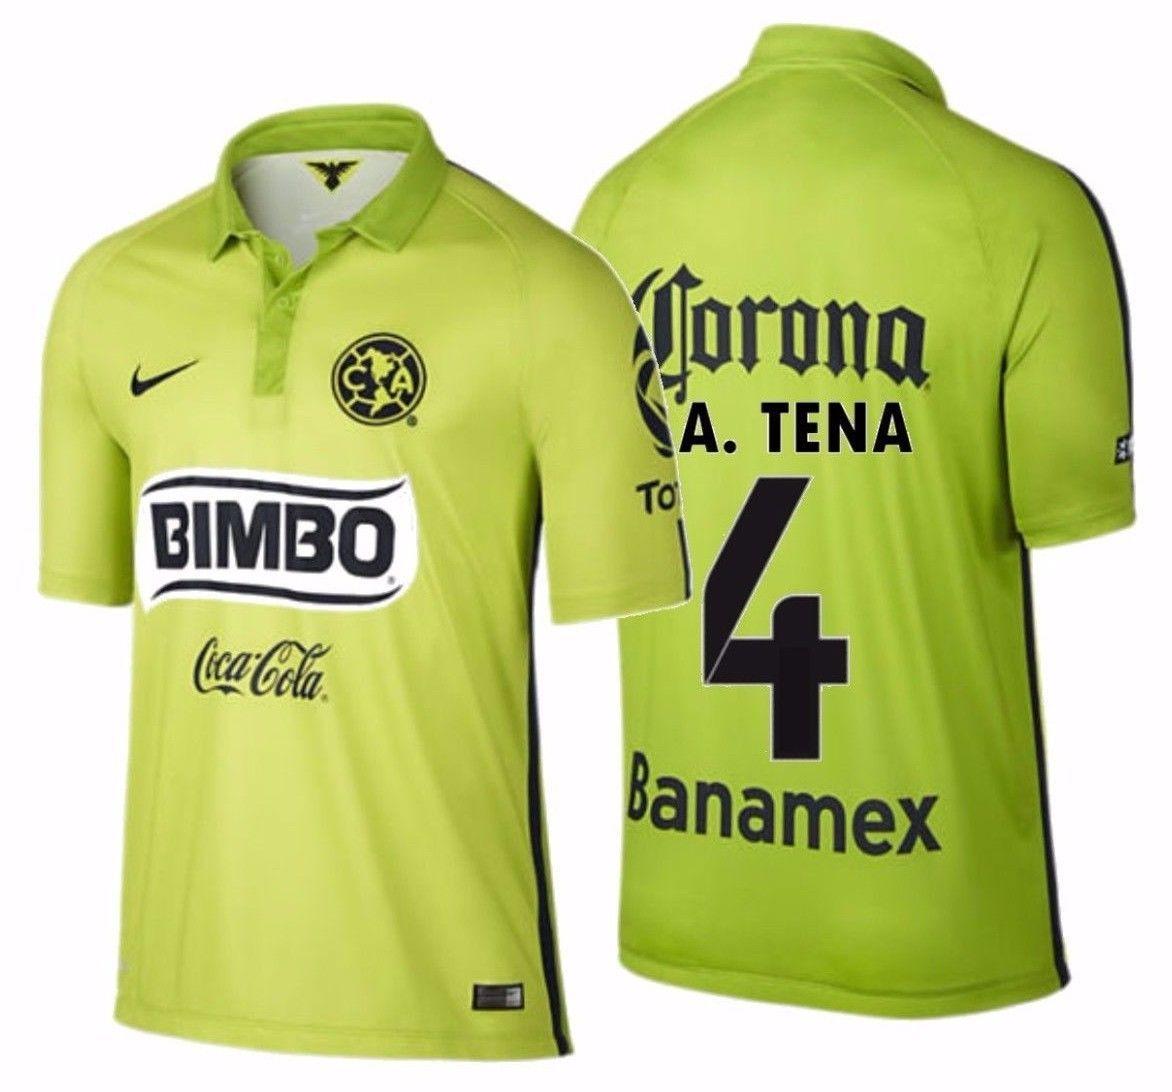 4411b5e0777 Nike Alfredo Tena Club America Third Jersey and 50 similar items. S l1600